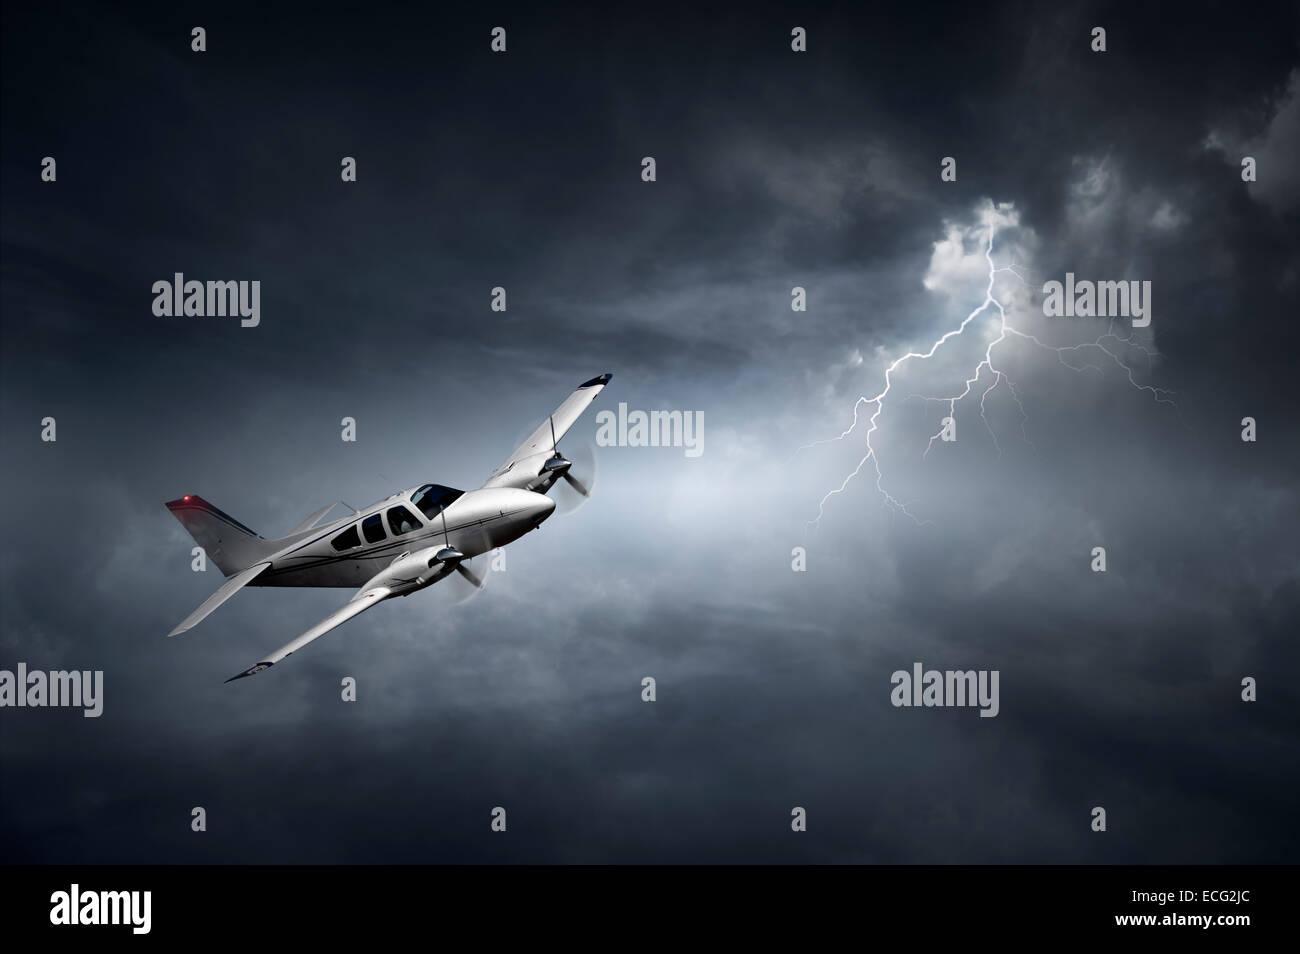 Aeroplane flying in storm with lightning (Concept of risk - digital artwork) - Stock Image